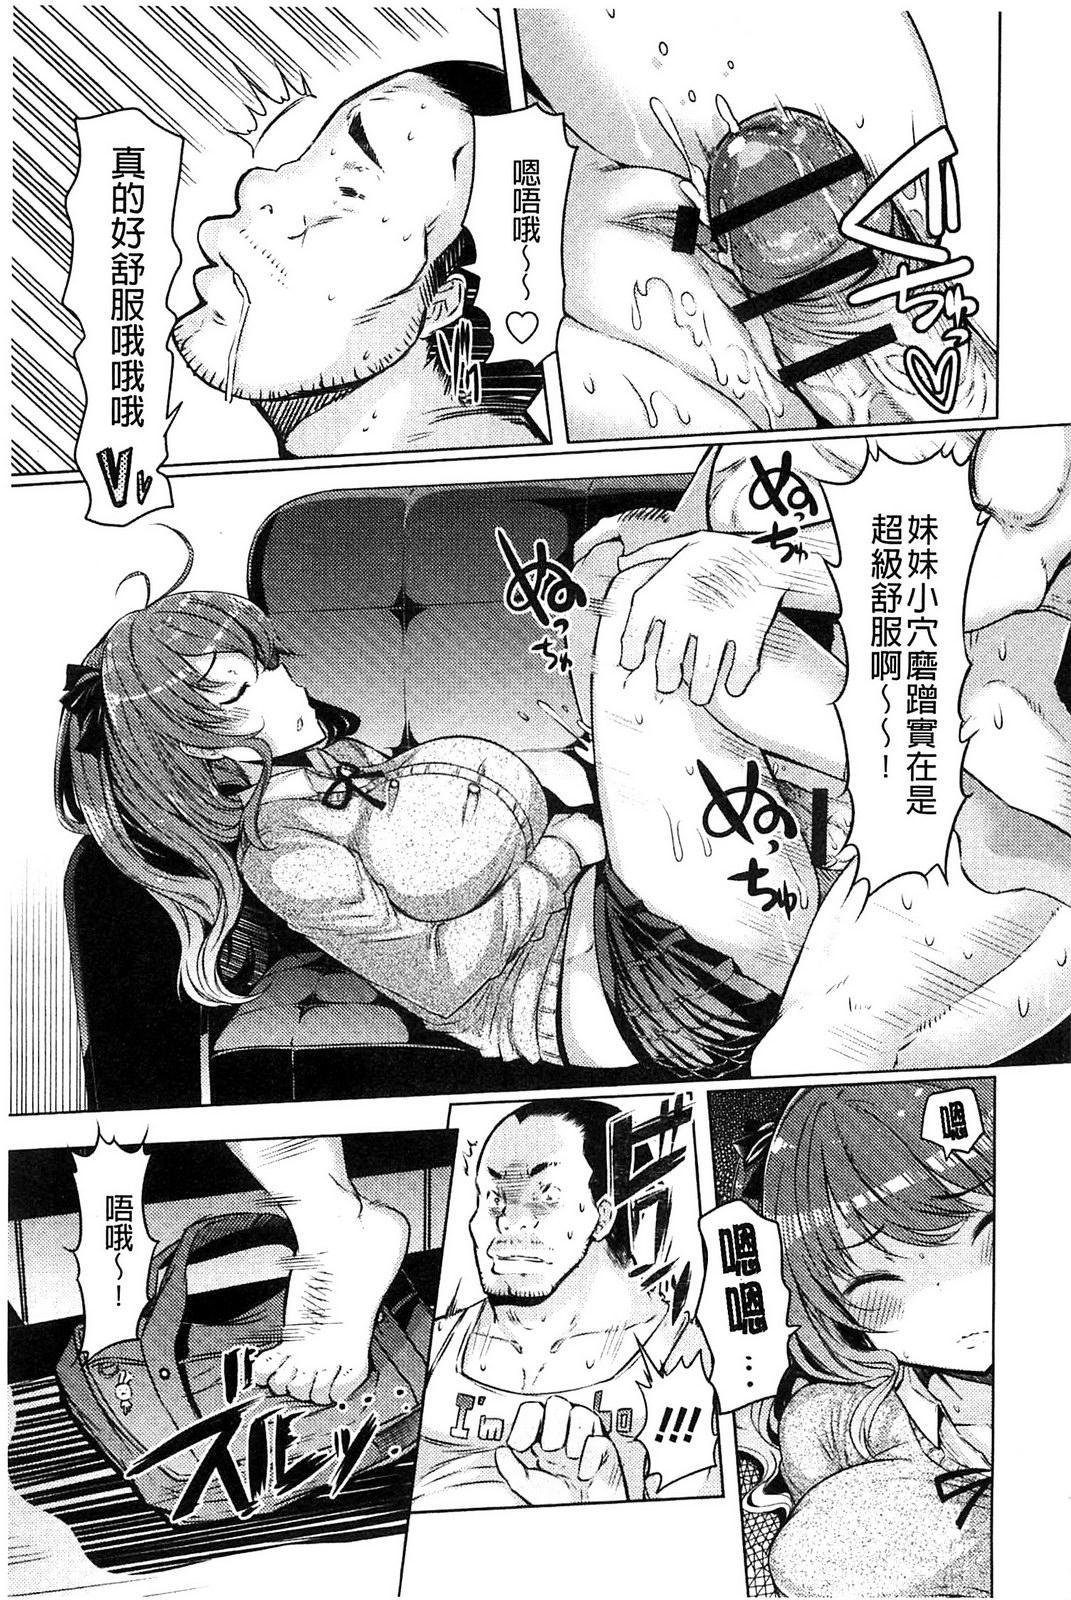 Imouto Kansatsu Nikki - The Record of Sex with My Sister 173